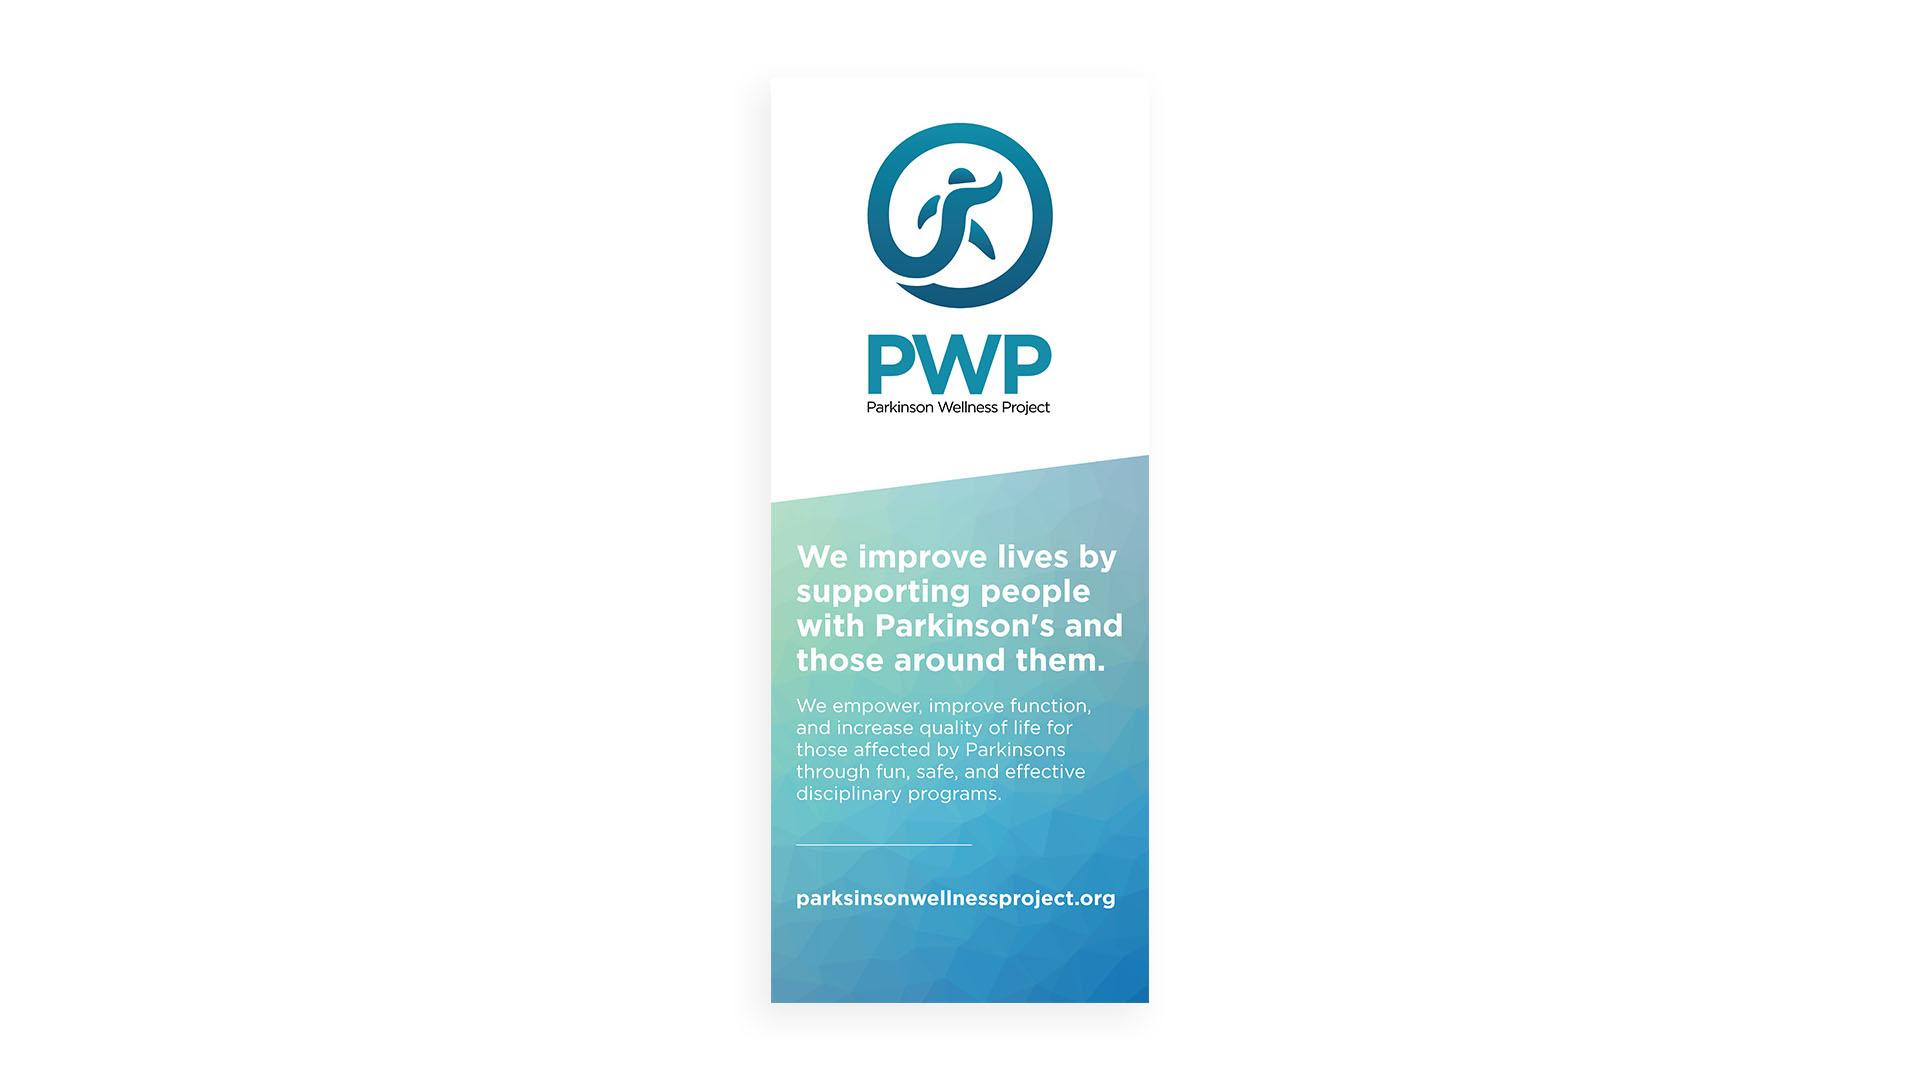 PWP-03.jpg